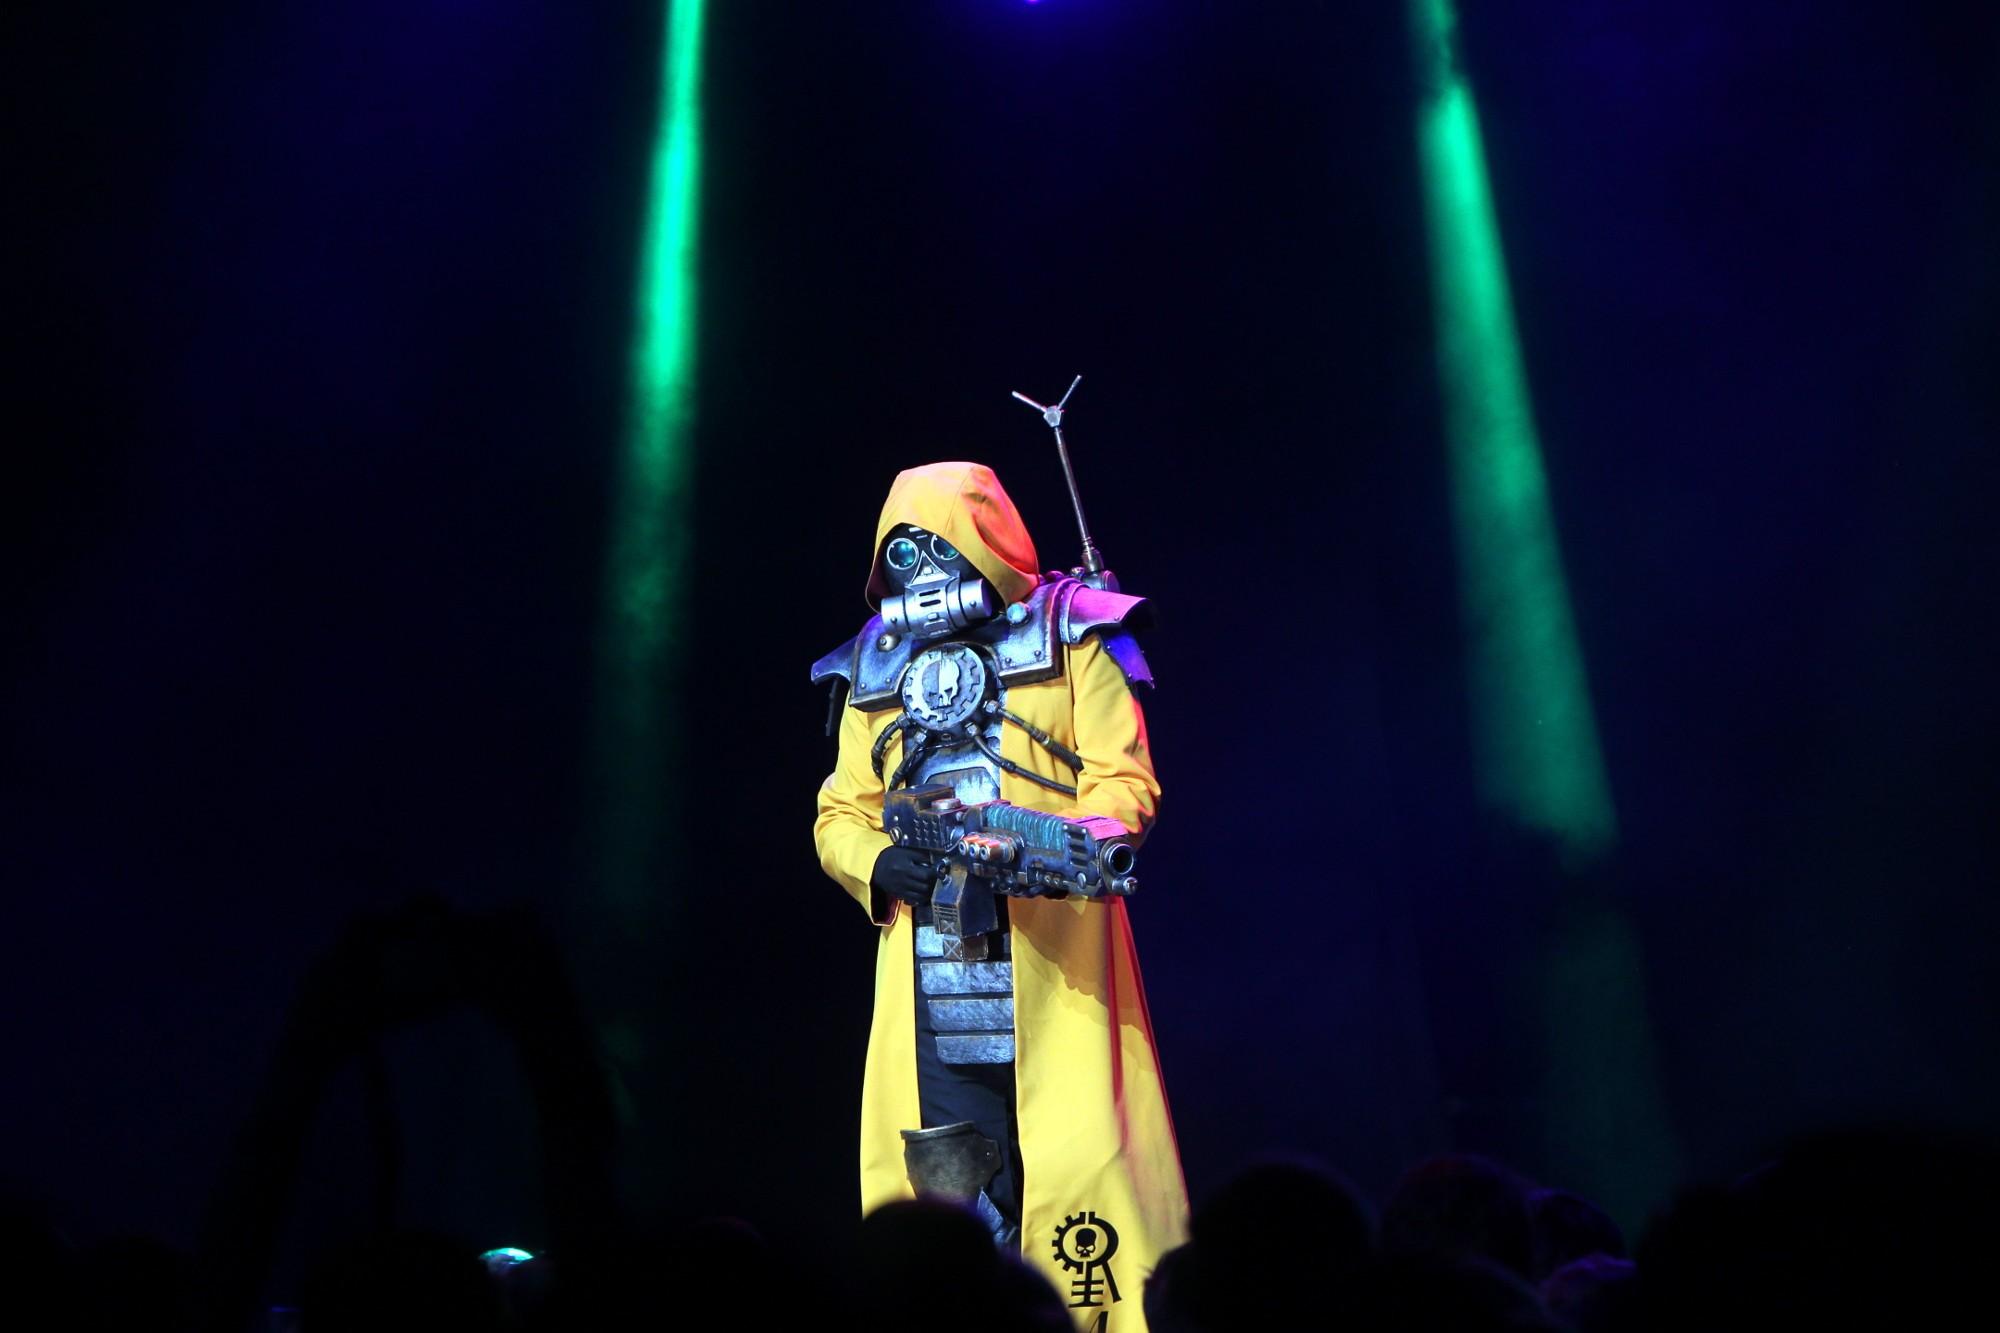 старкон фестиваль косплей фантастика костюмы